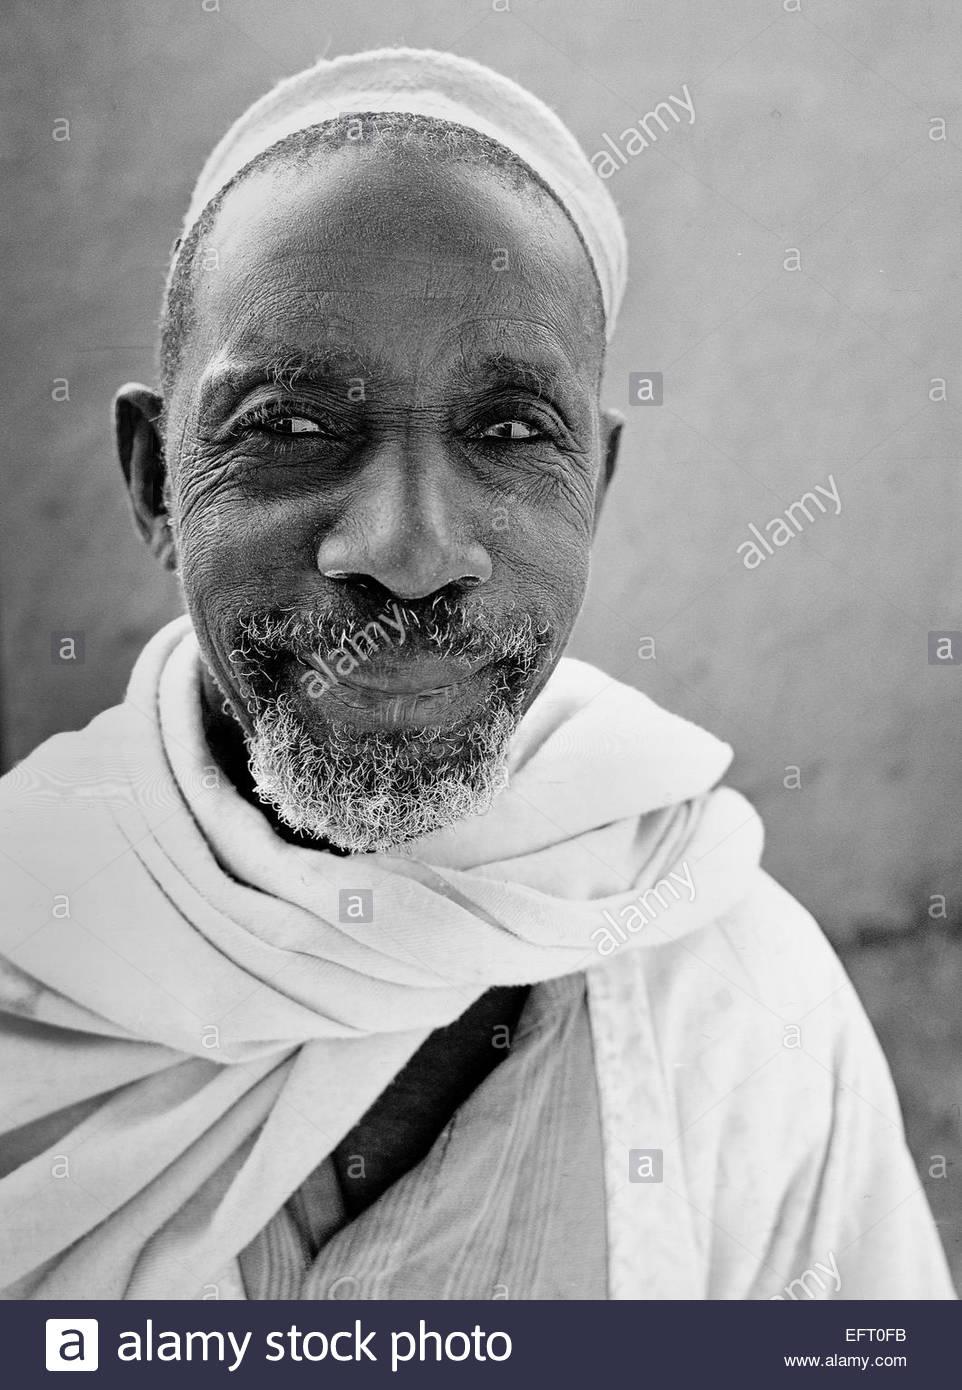 Republic Of Niger NER Western Africa Sahara Desert 2000 People Person Elderly Senior Head And Shoulders Headshot - Stock Image